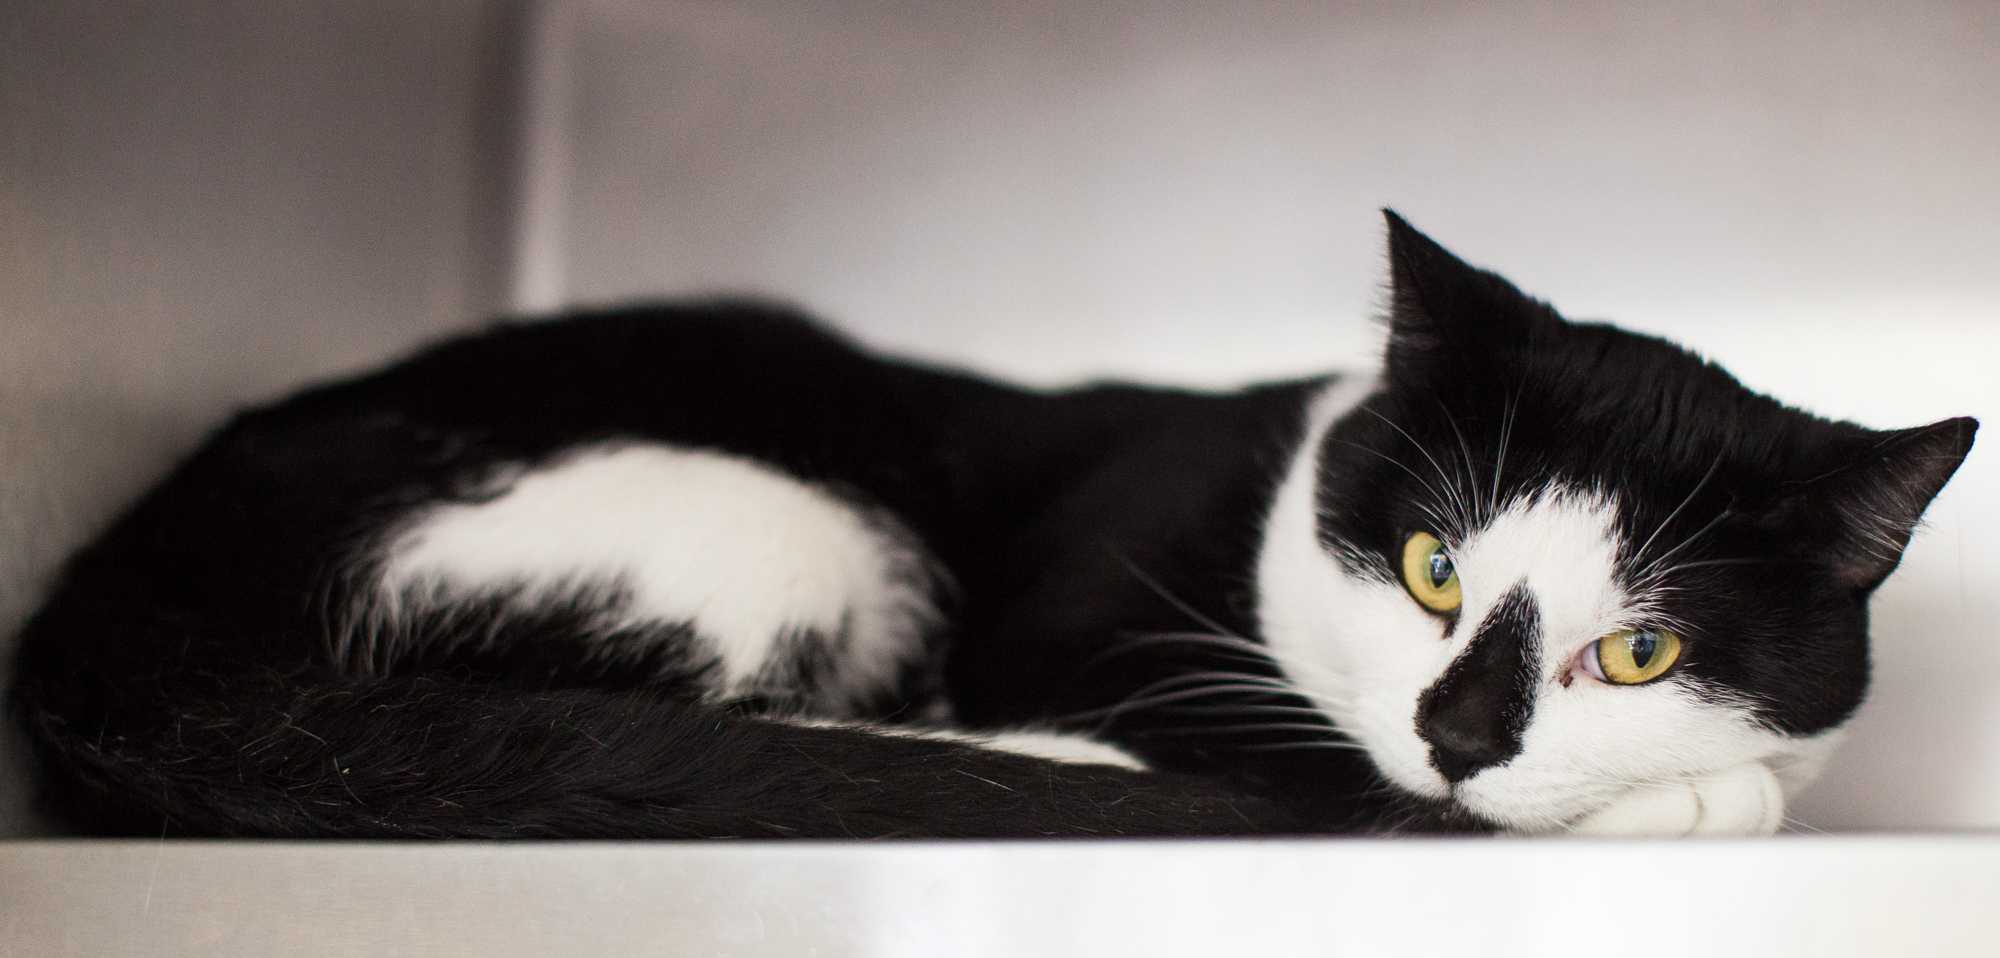 054_animal-photography-cats-dogs-volunteer_MG_8680.jpg